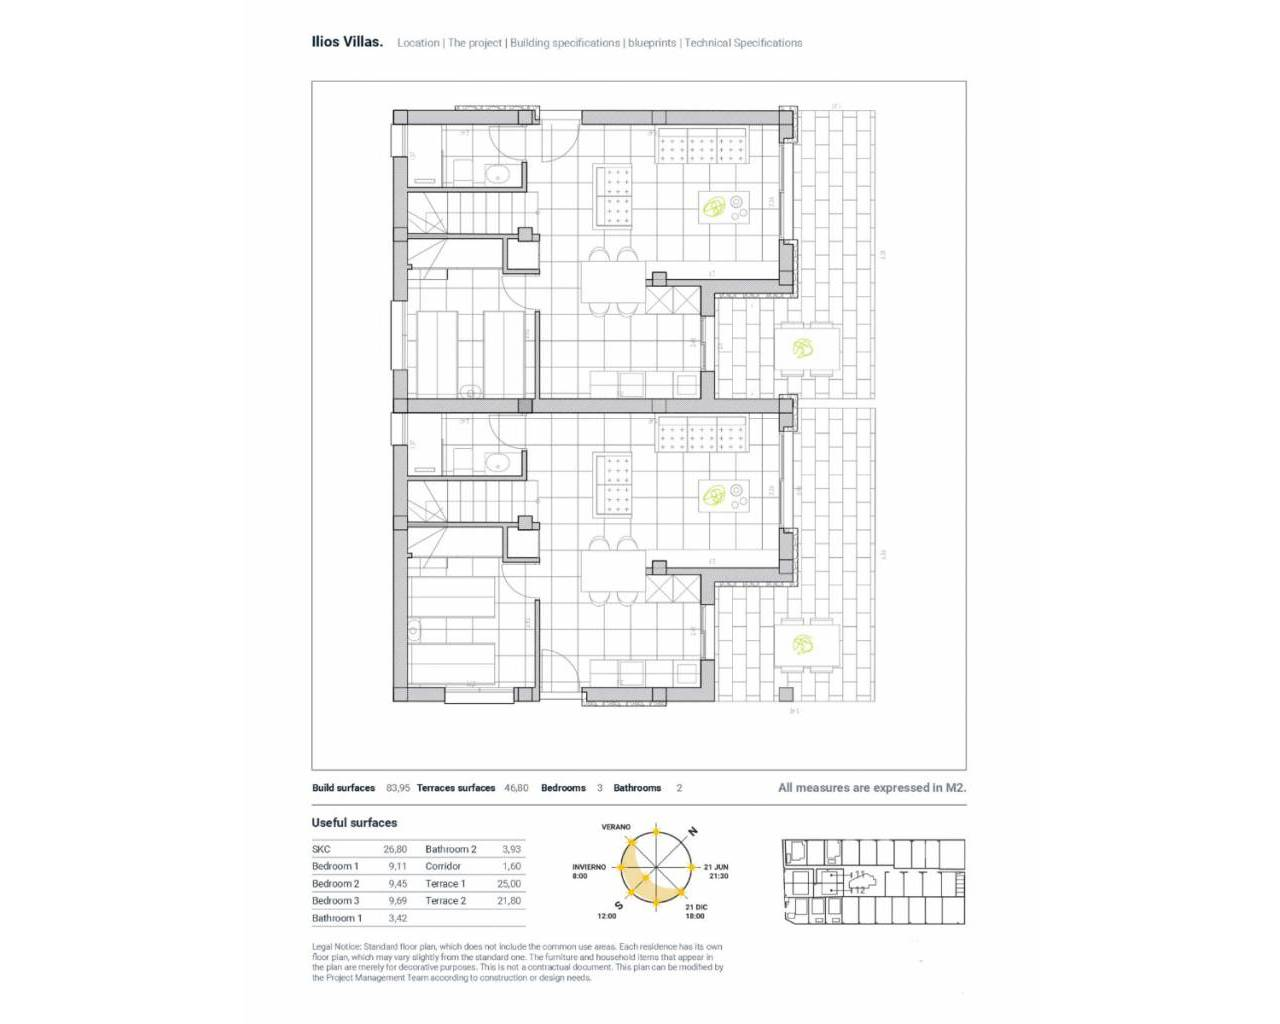 nieuwbouw-kwadrantwoning-orihuela-costa-villamartin-golf_5501_xl